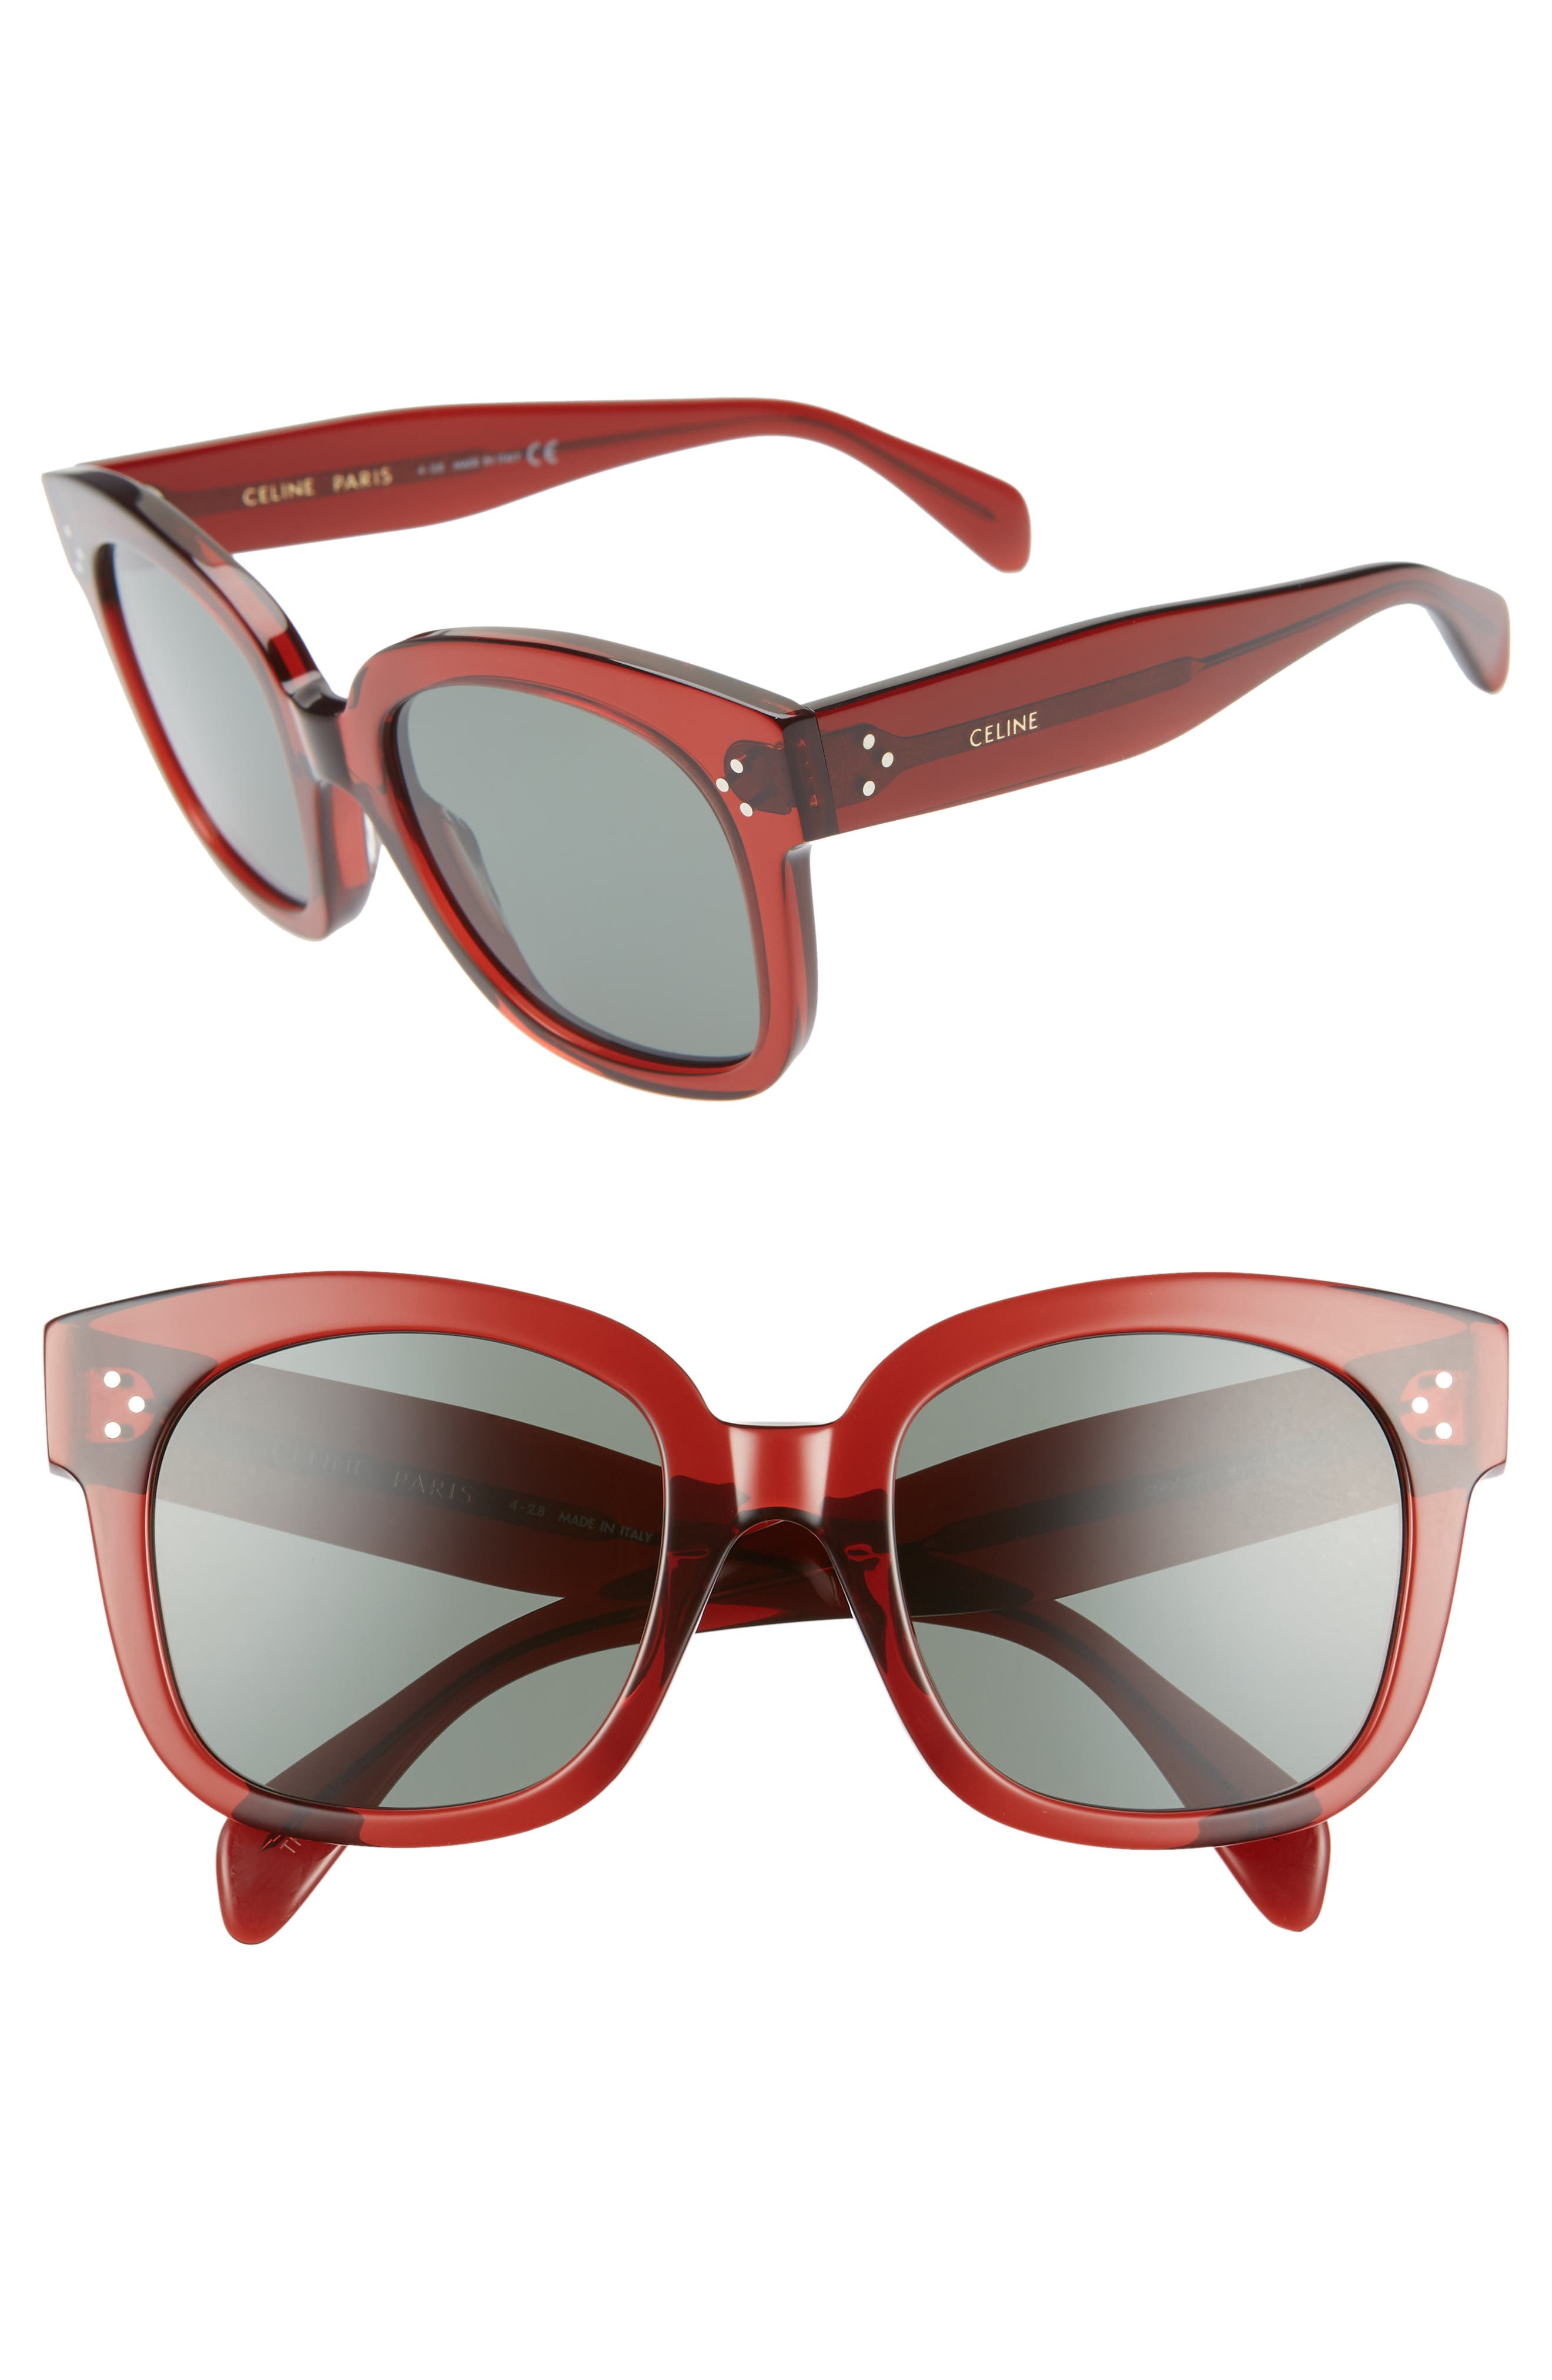 54mm Round Sunglasses,                             Main thumbnail 1, color,                             BORDEAUX/ GREEN